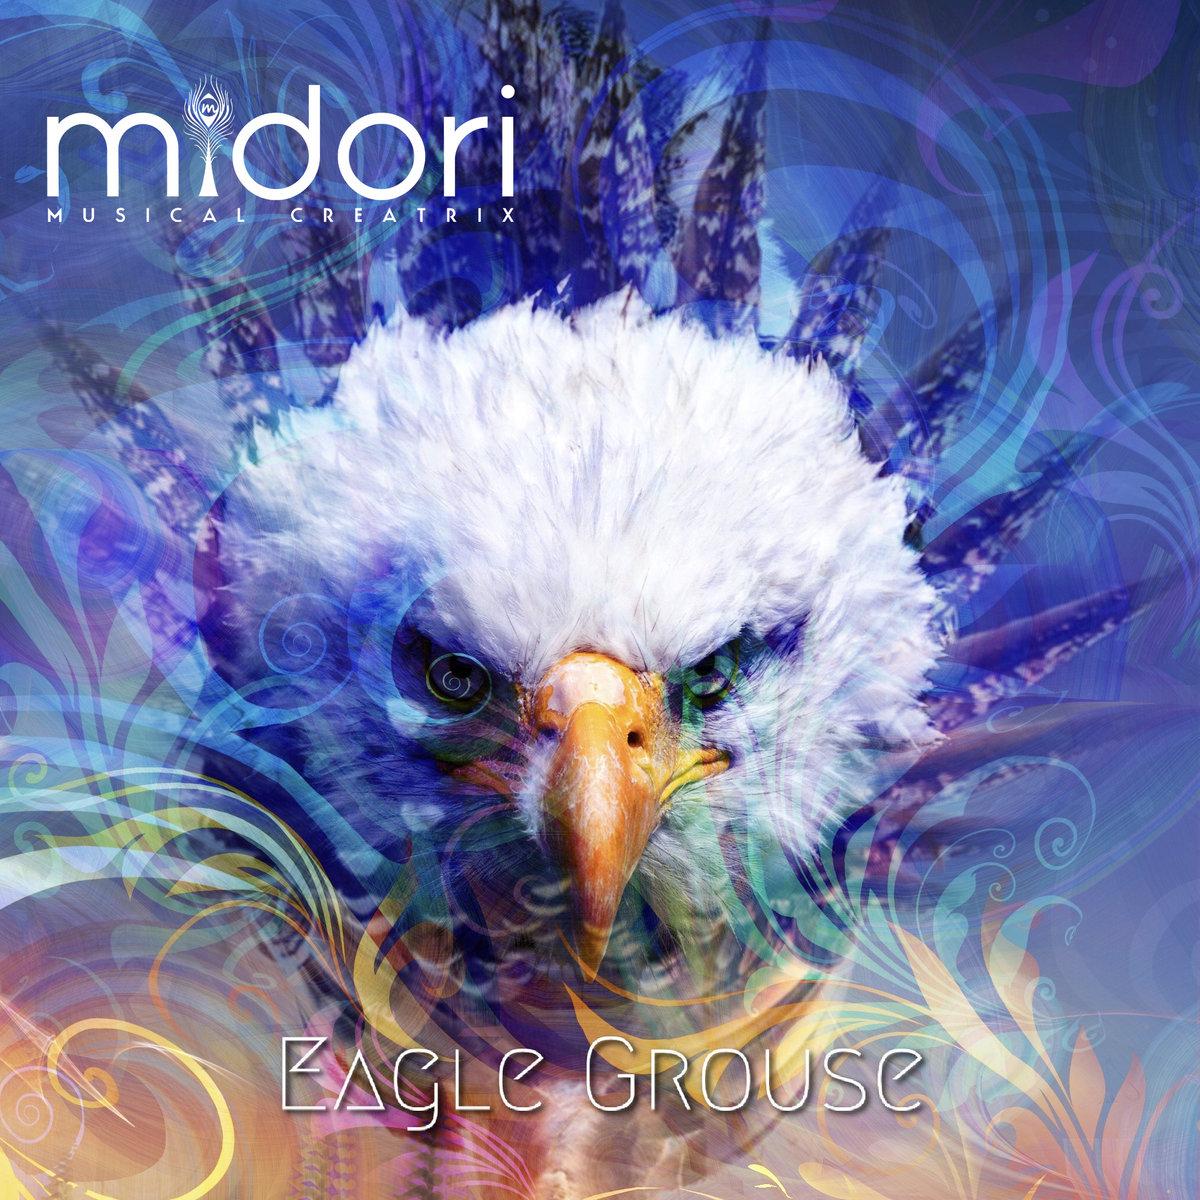 Eagle Grouse by Midori